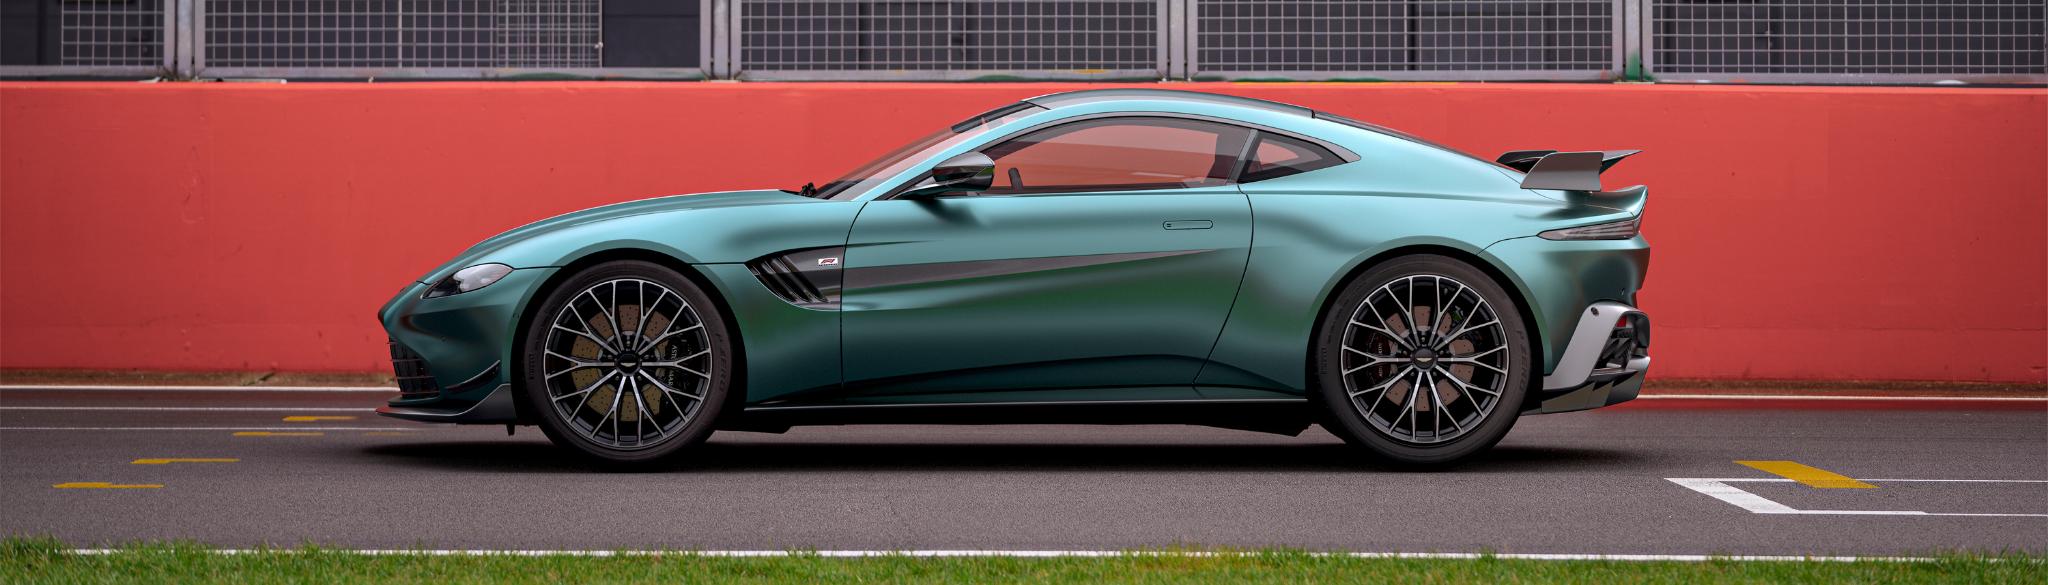 Side F1 Edition Aston Martin